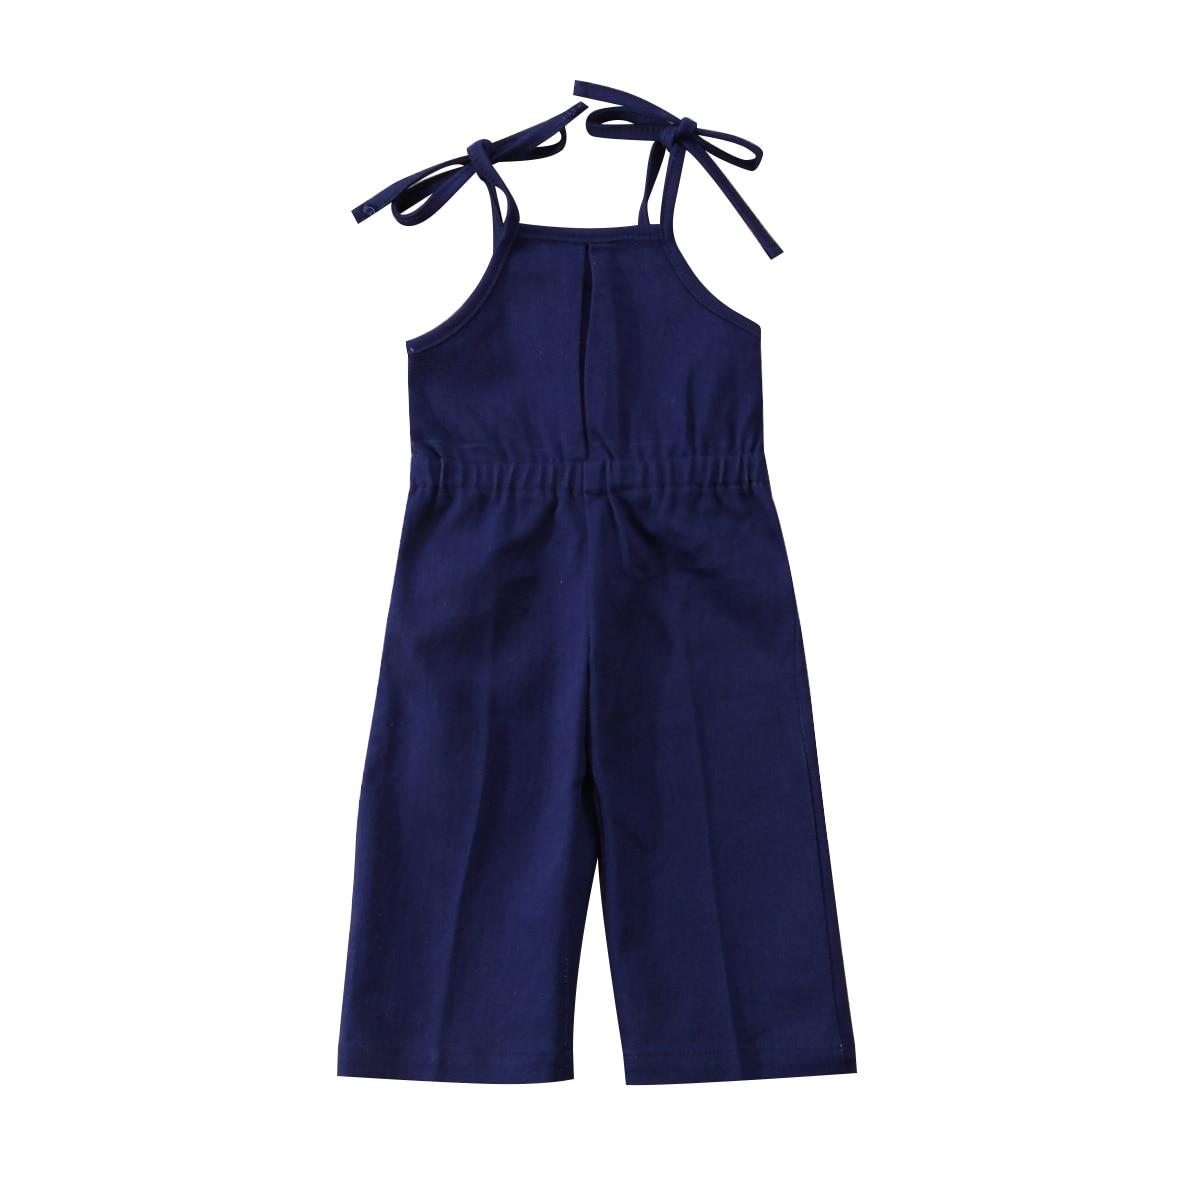 Newborn Kids Girls Denim Strap Bib Pants Romper Jumpsuit Playsuit Outfit Clothes Toddler Adorable Baby Summer Denim Romper 1-7Y